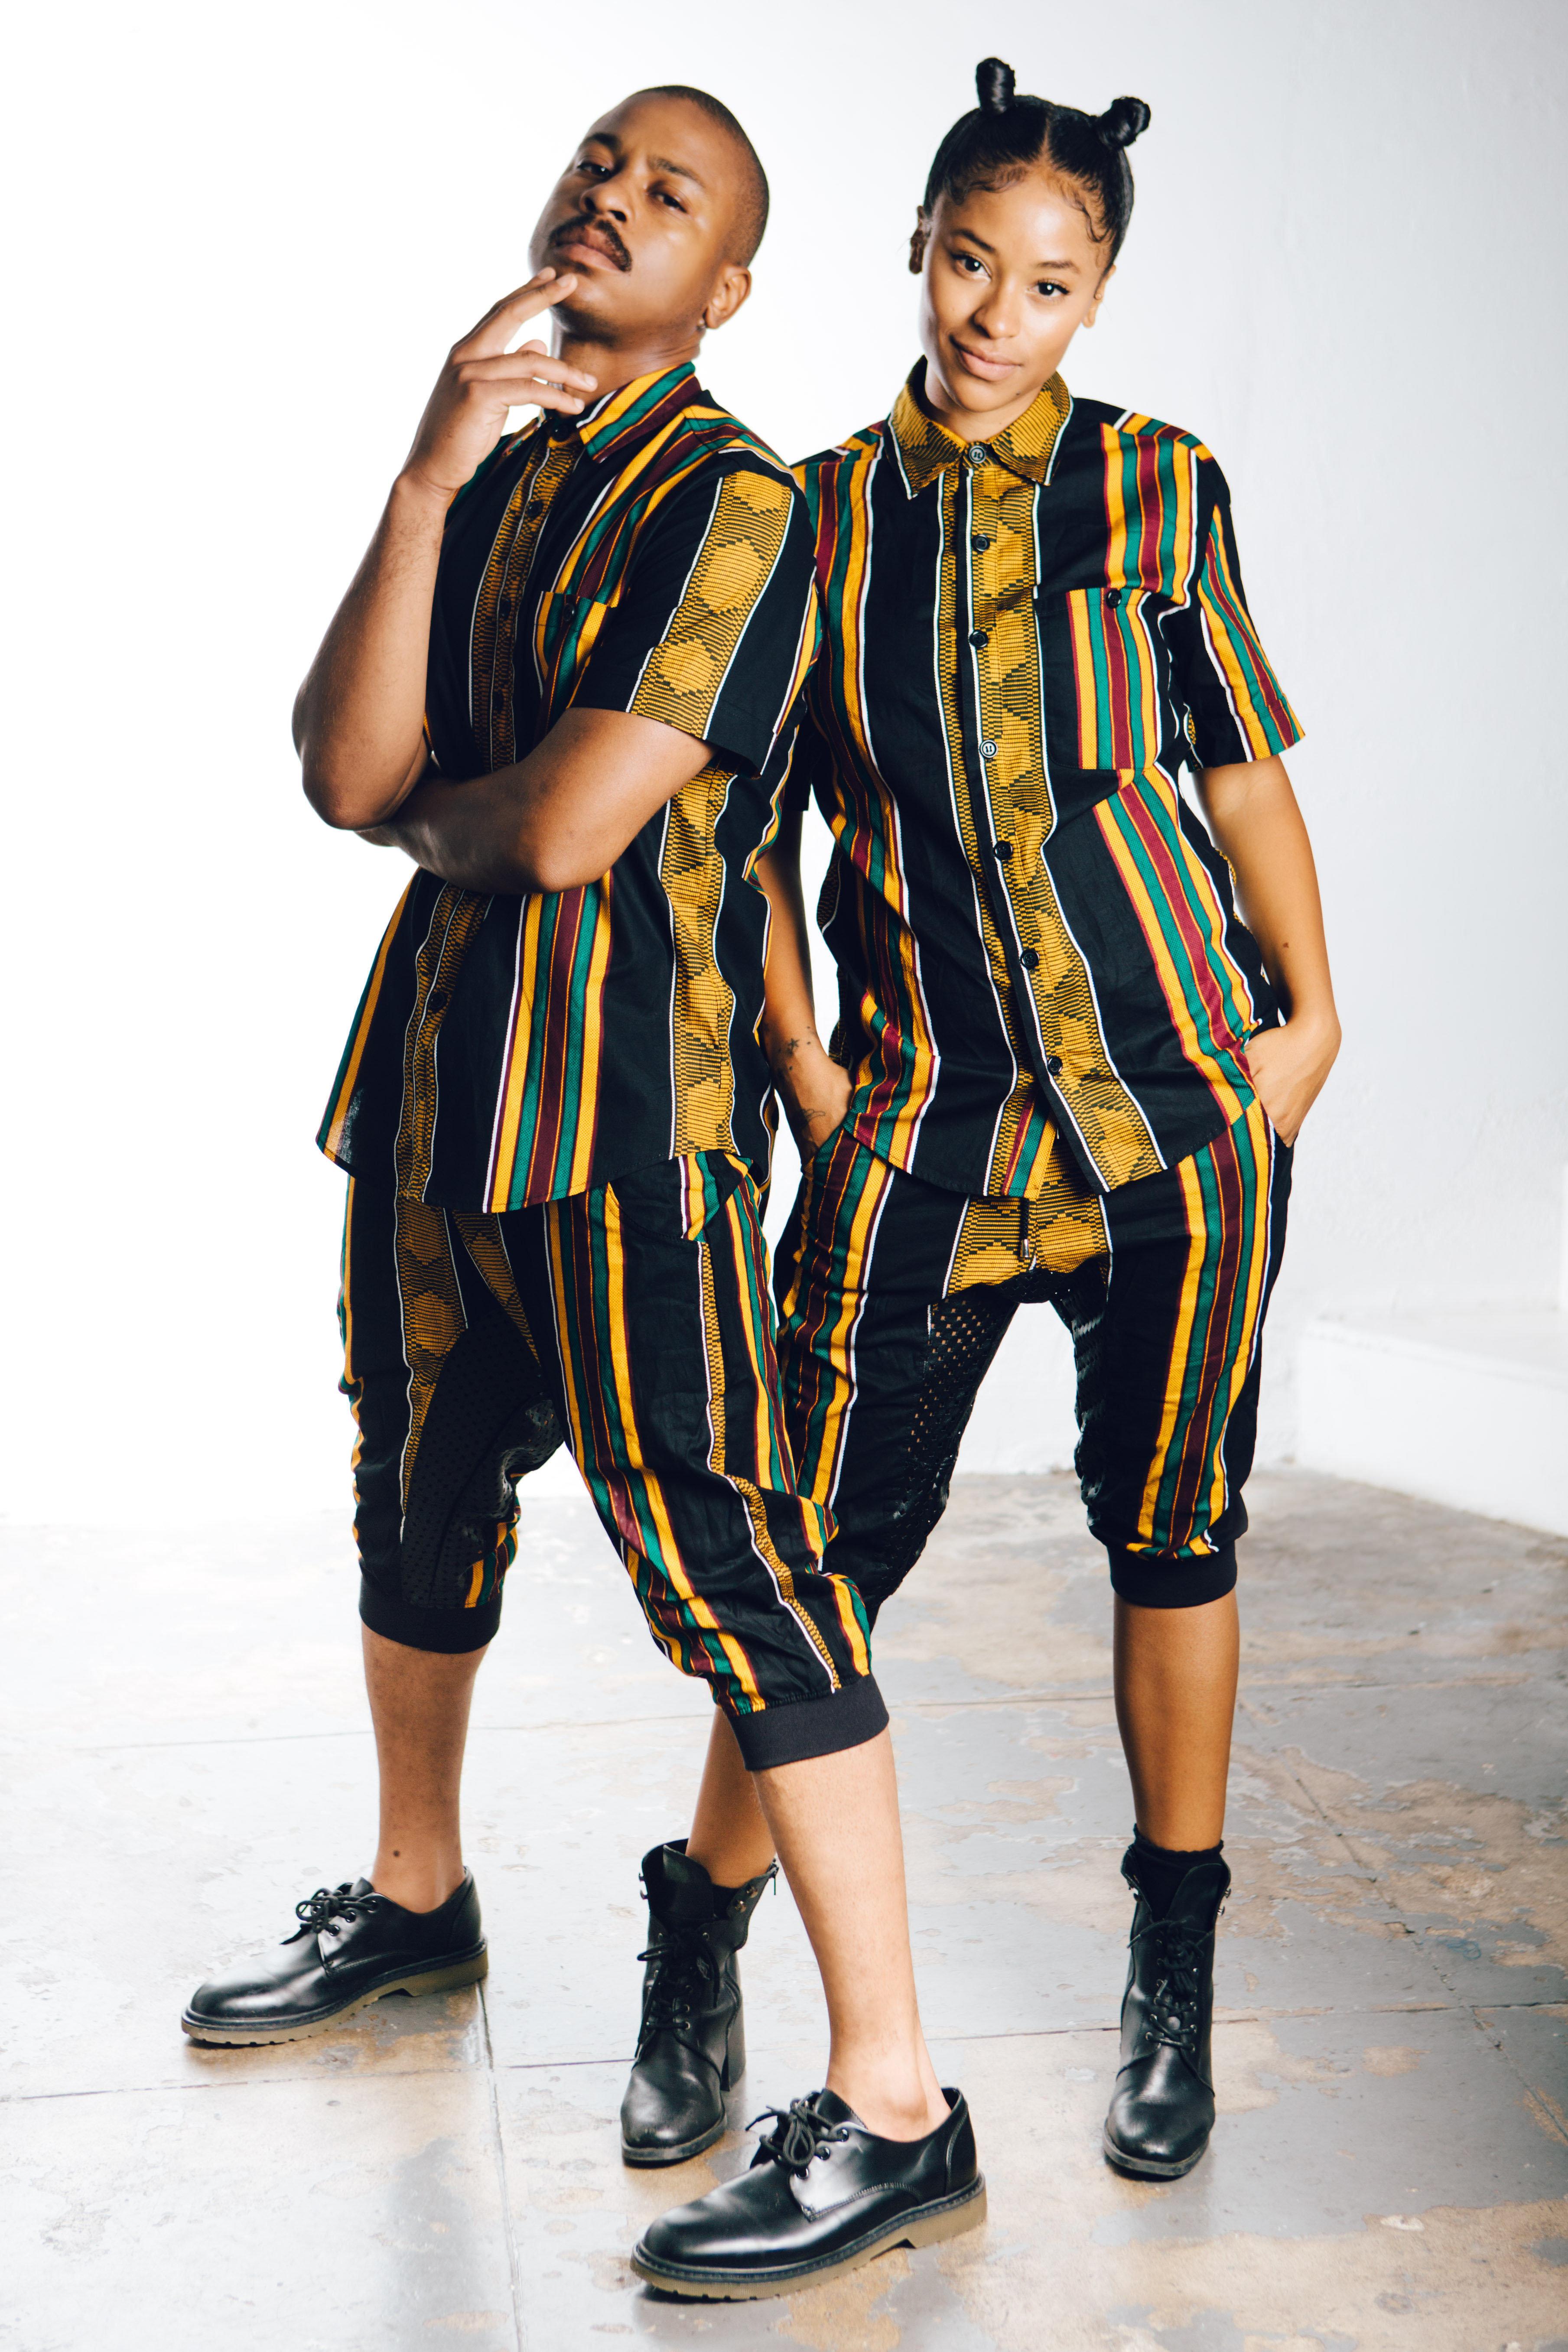 The Famous quebec fashion designers